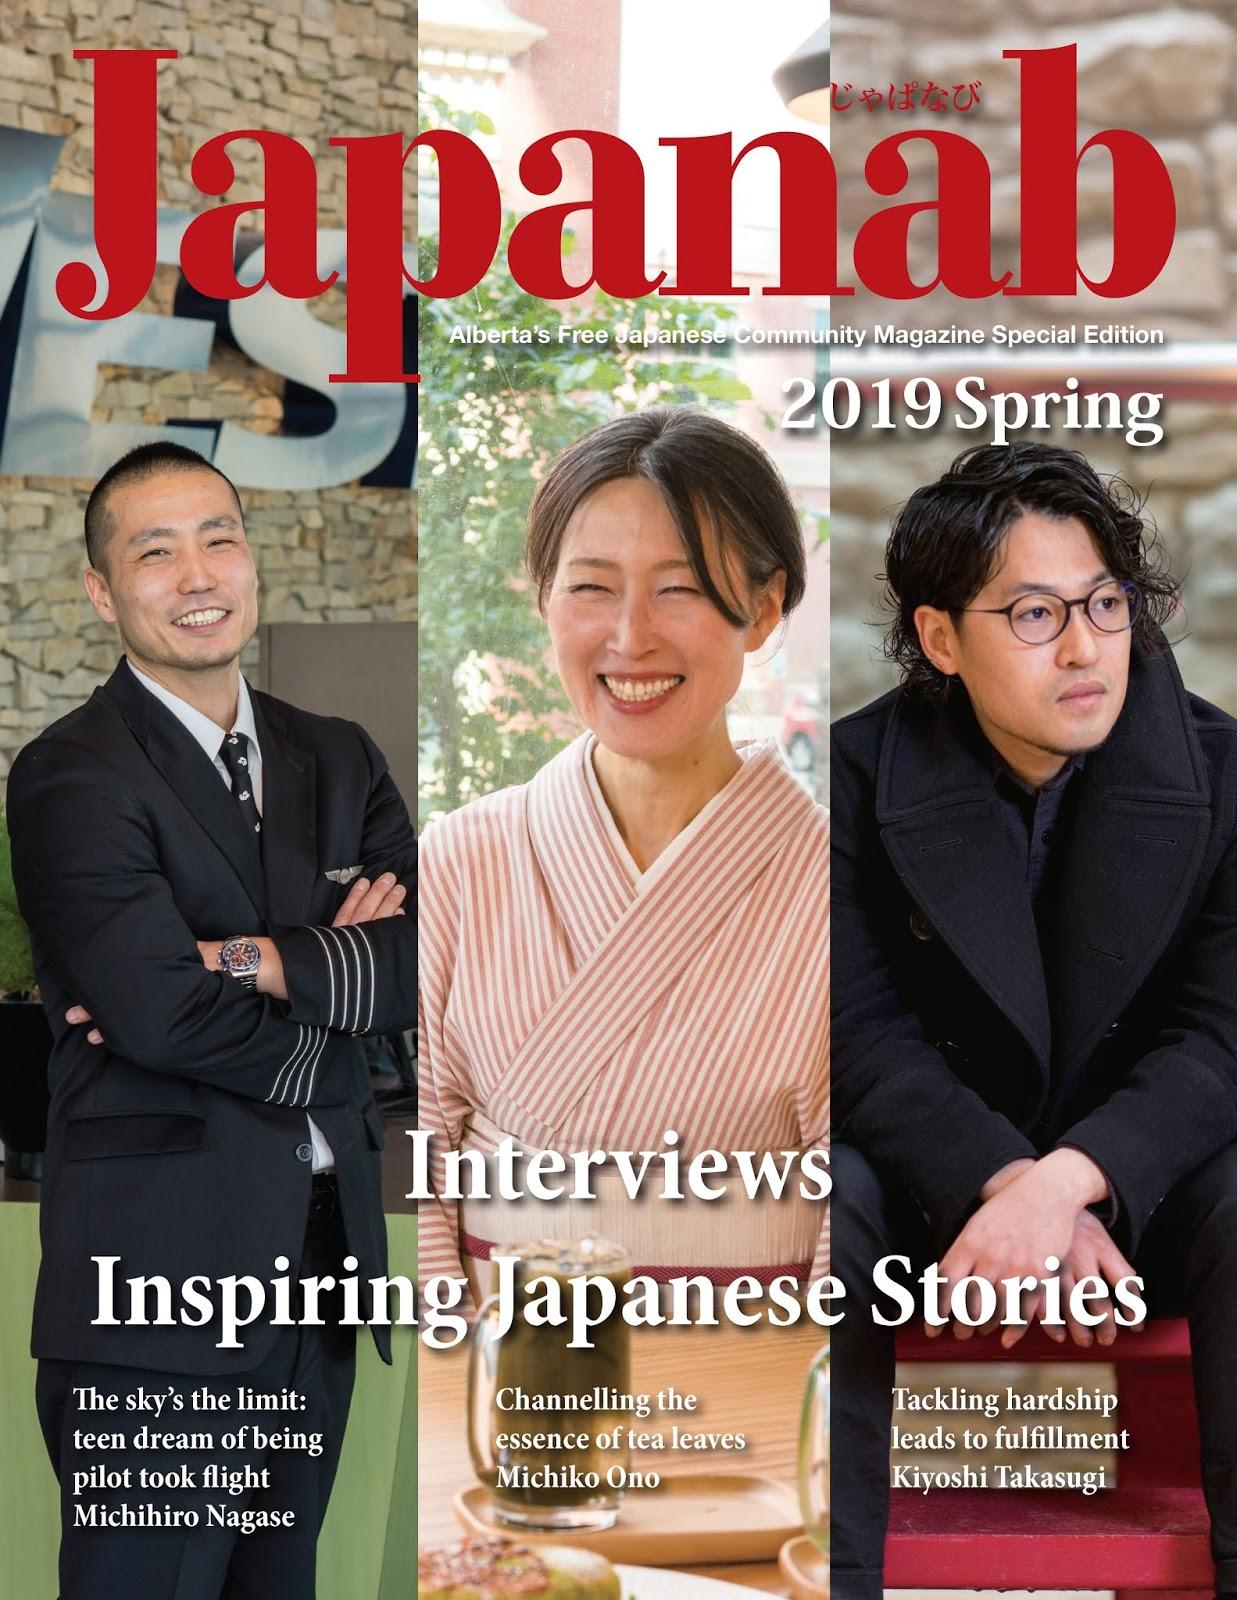 Japanab Special Edition - 2019 Spring